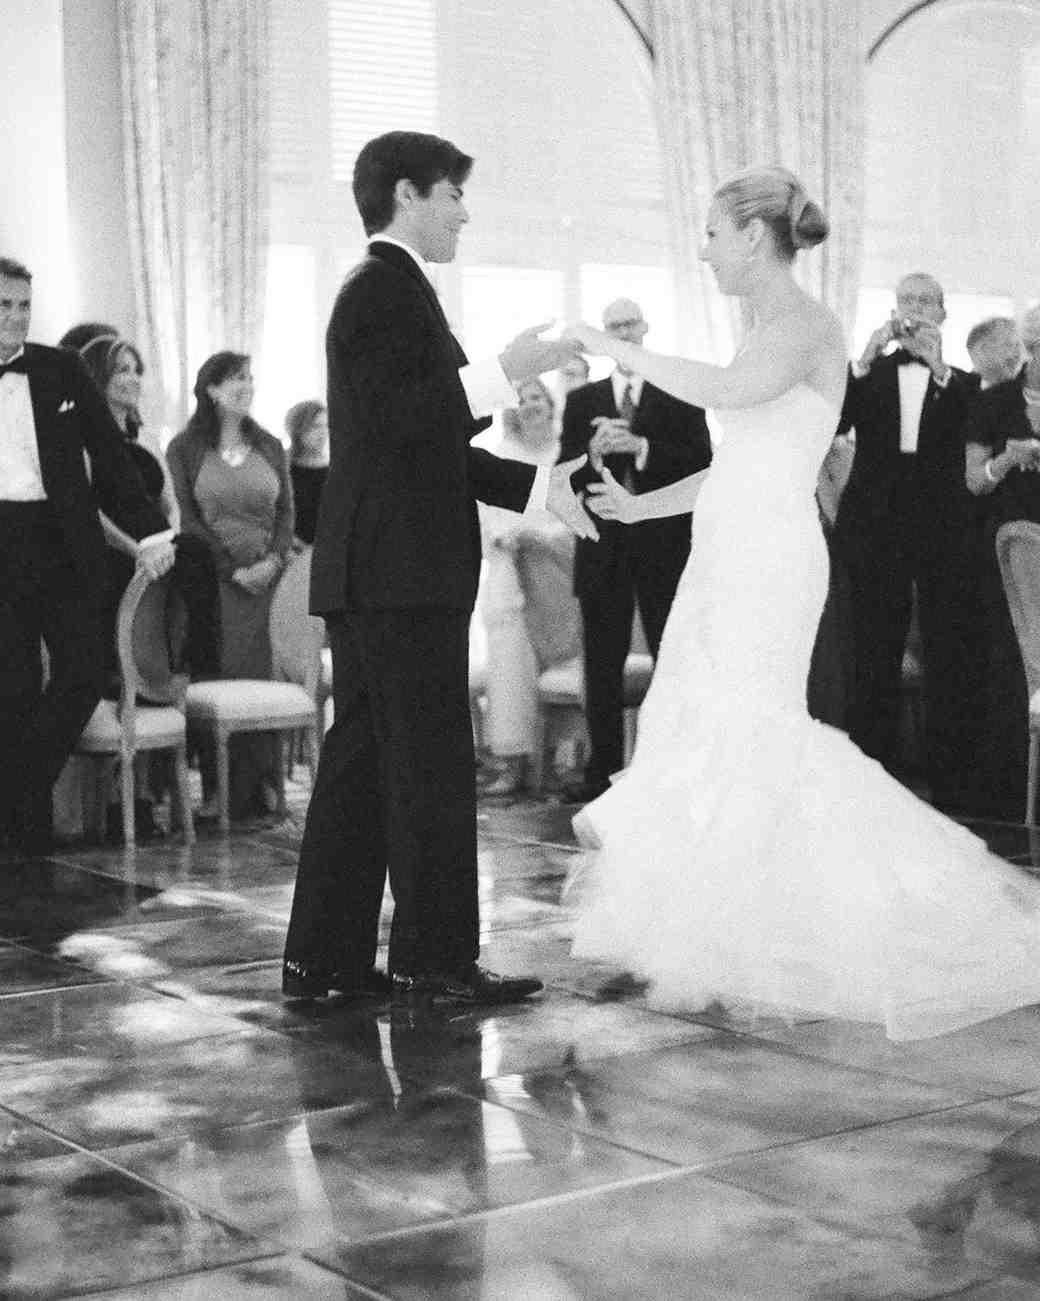 tiffany-david-wedding-firstdance-1921-s112676-1115.jpg